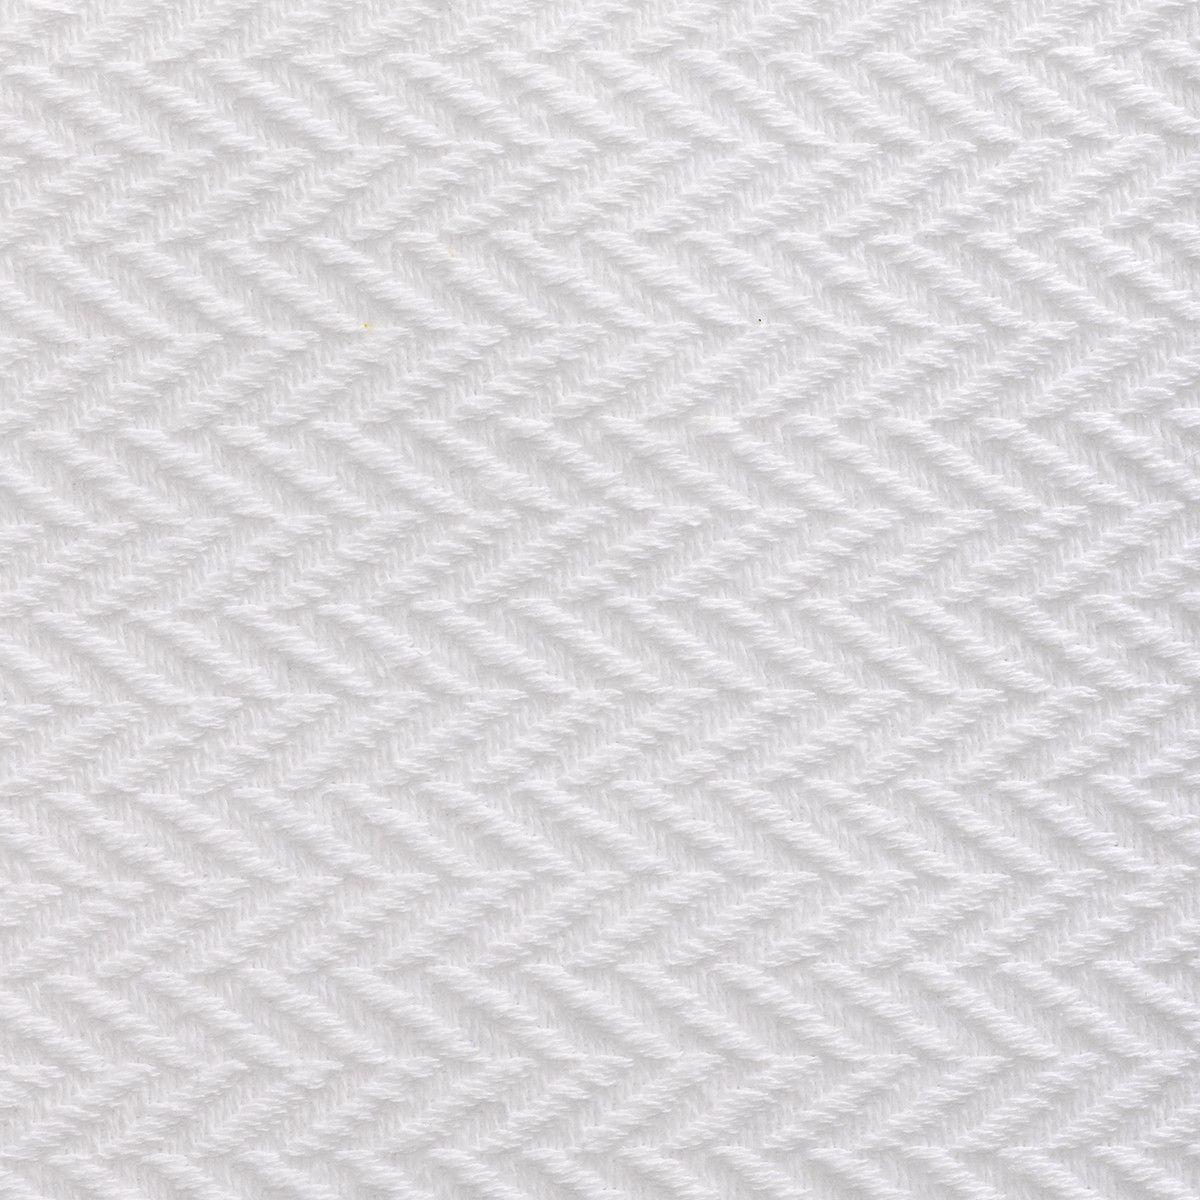 ANICHINI Fabrics | Chevron White Residential Fabric - a white ...